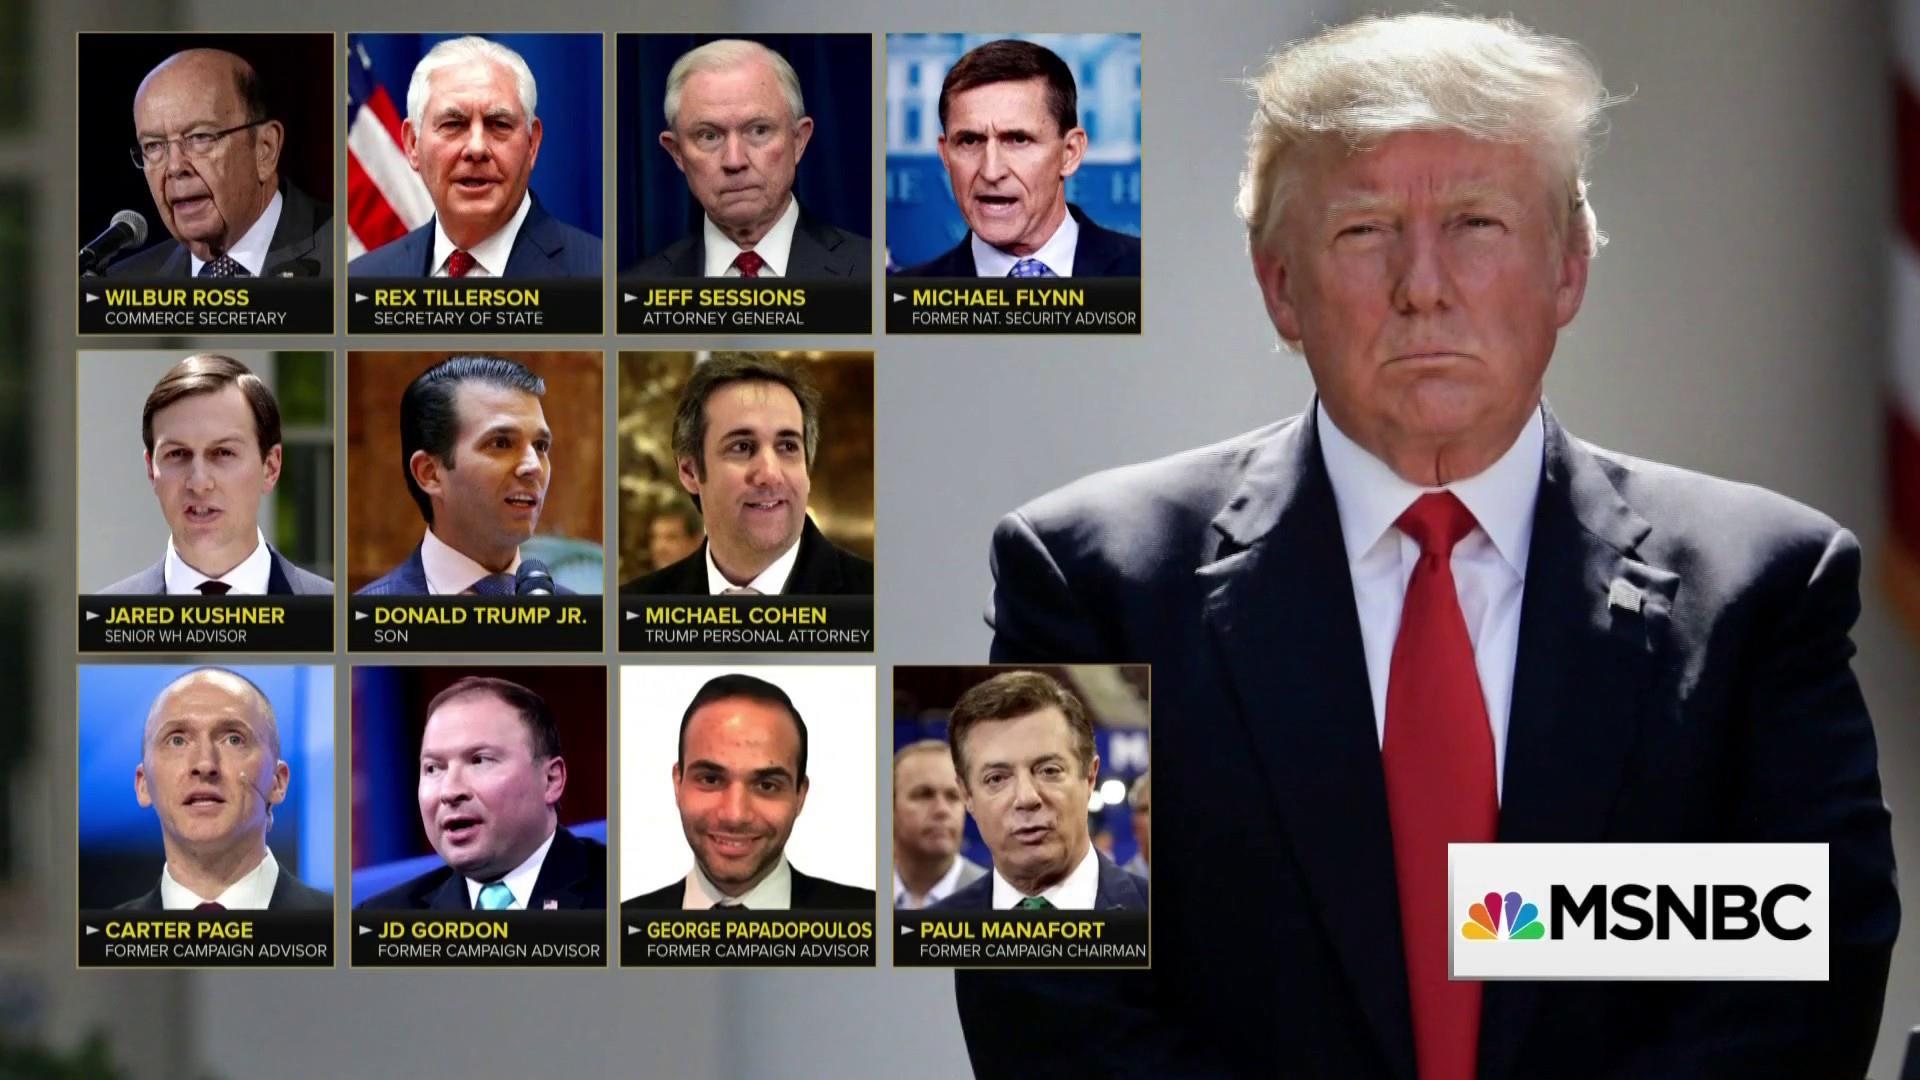 New papers show even deeper Trump Russia ties